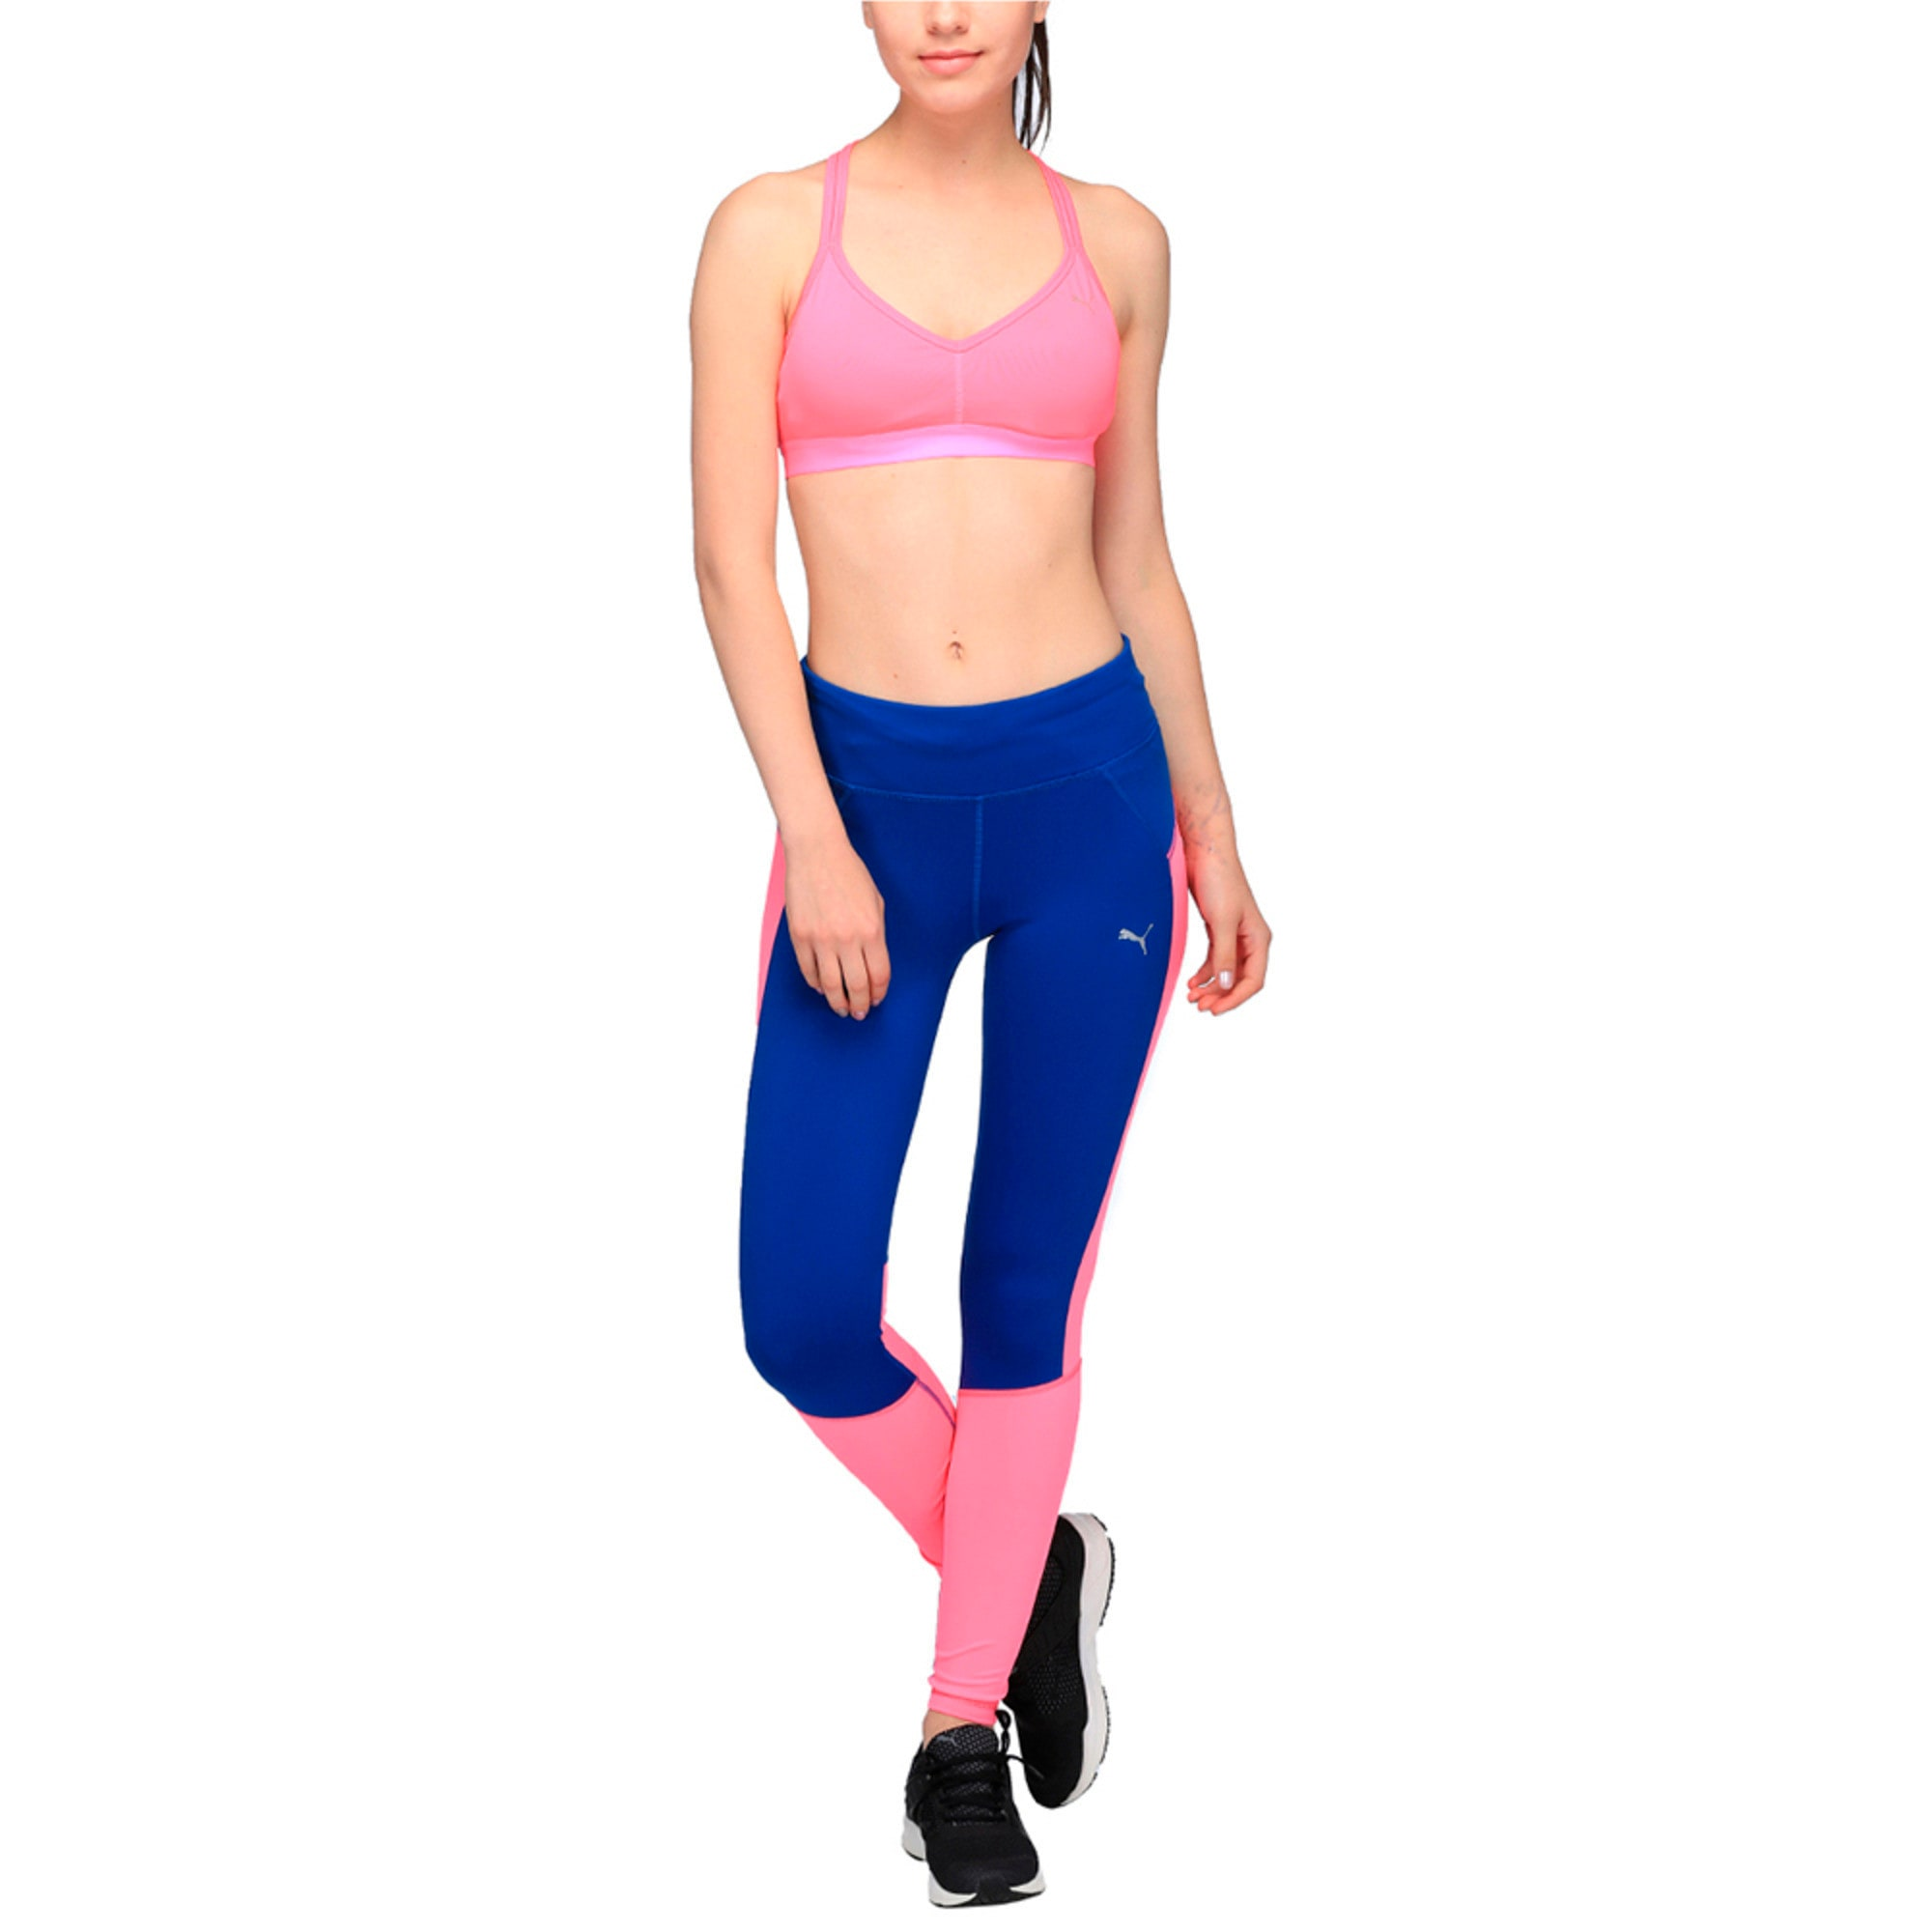 Thumbnail 3 of Running Women's Speed Tights, KNOCKOUT PINK-TRUE BLUE, medium-IND